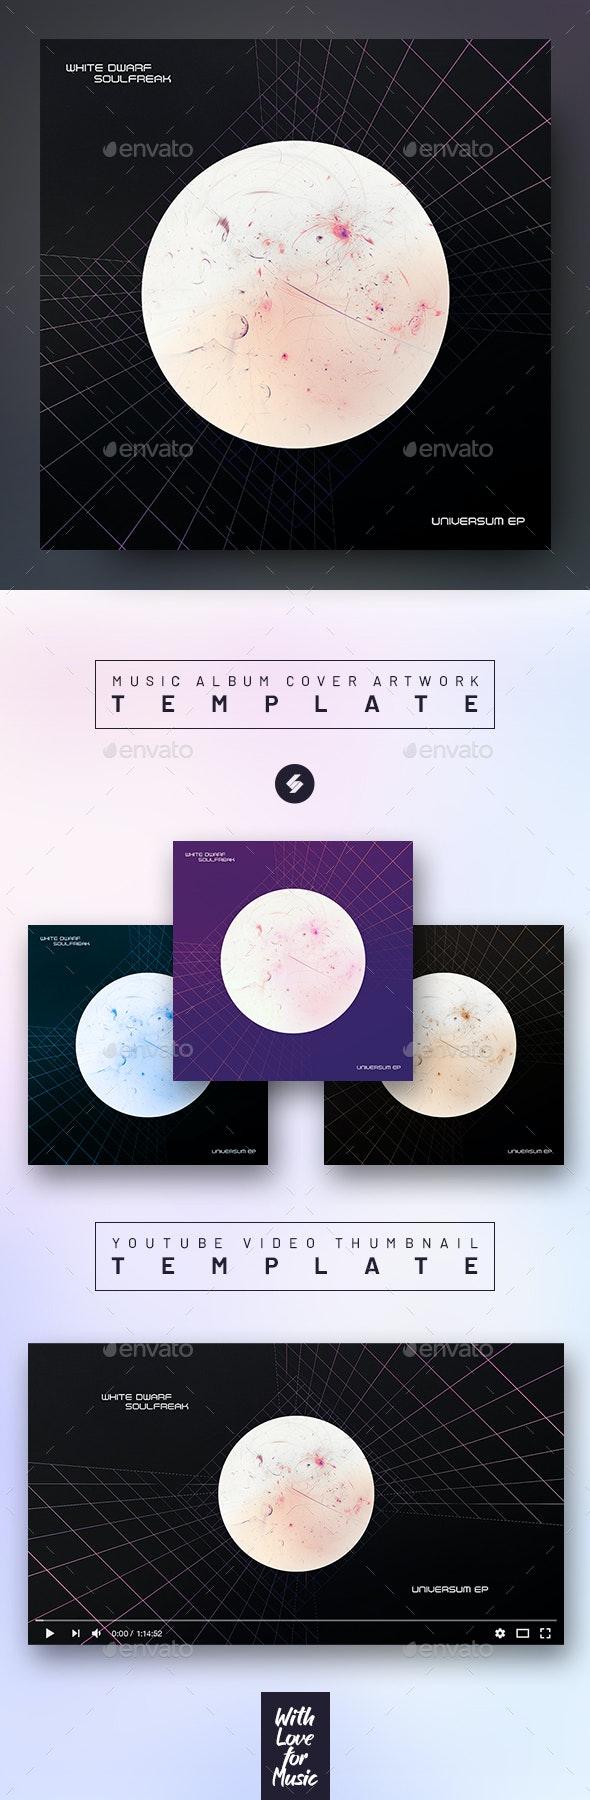 White Dwarf – Minimal Album Cover Artwork / Video Thumbnail Template - Miscellaneous Social Media